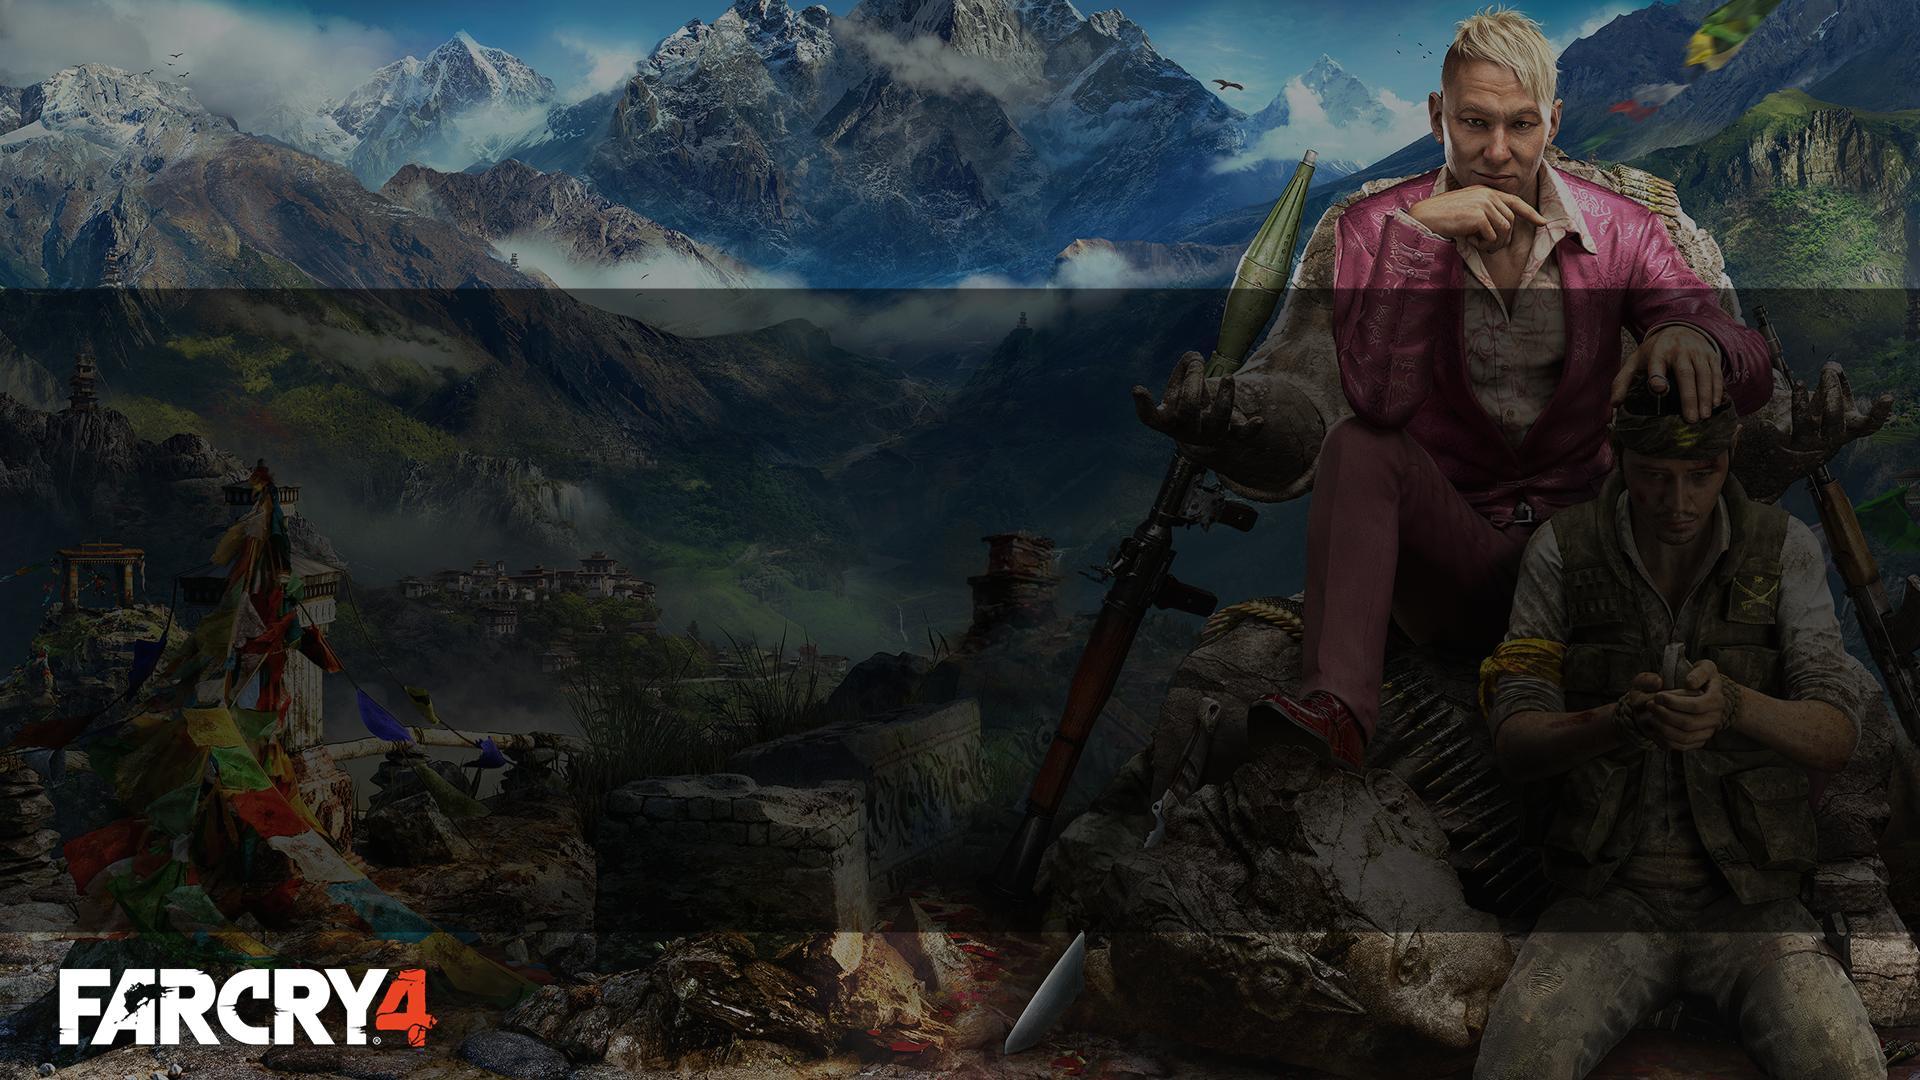 Far Cry 4 - Pagan Min